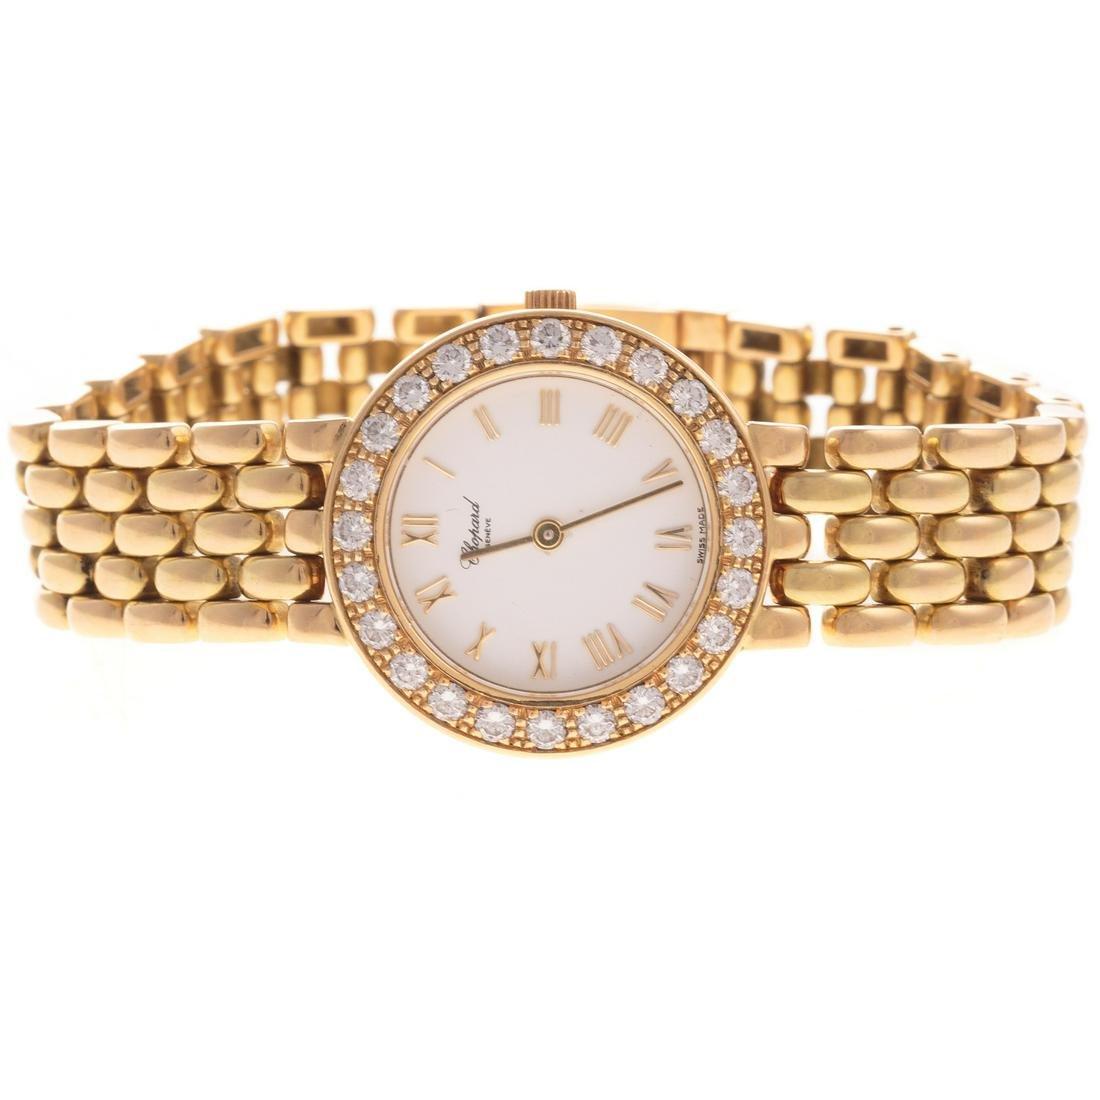 A Ladies 18K Diamond Chopard Dress Watch